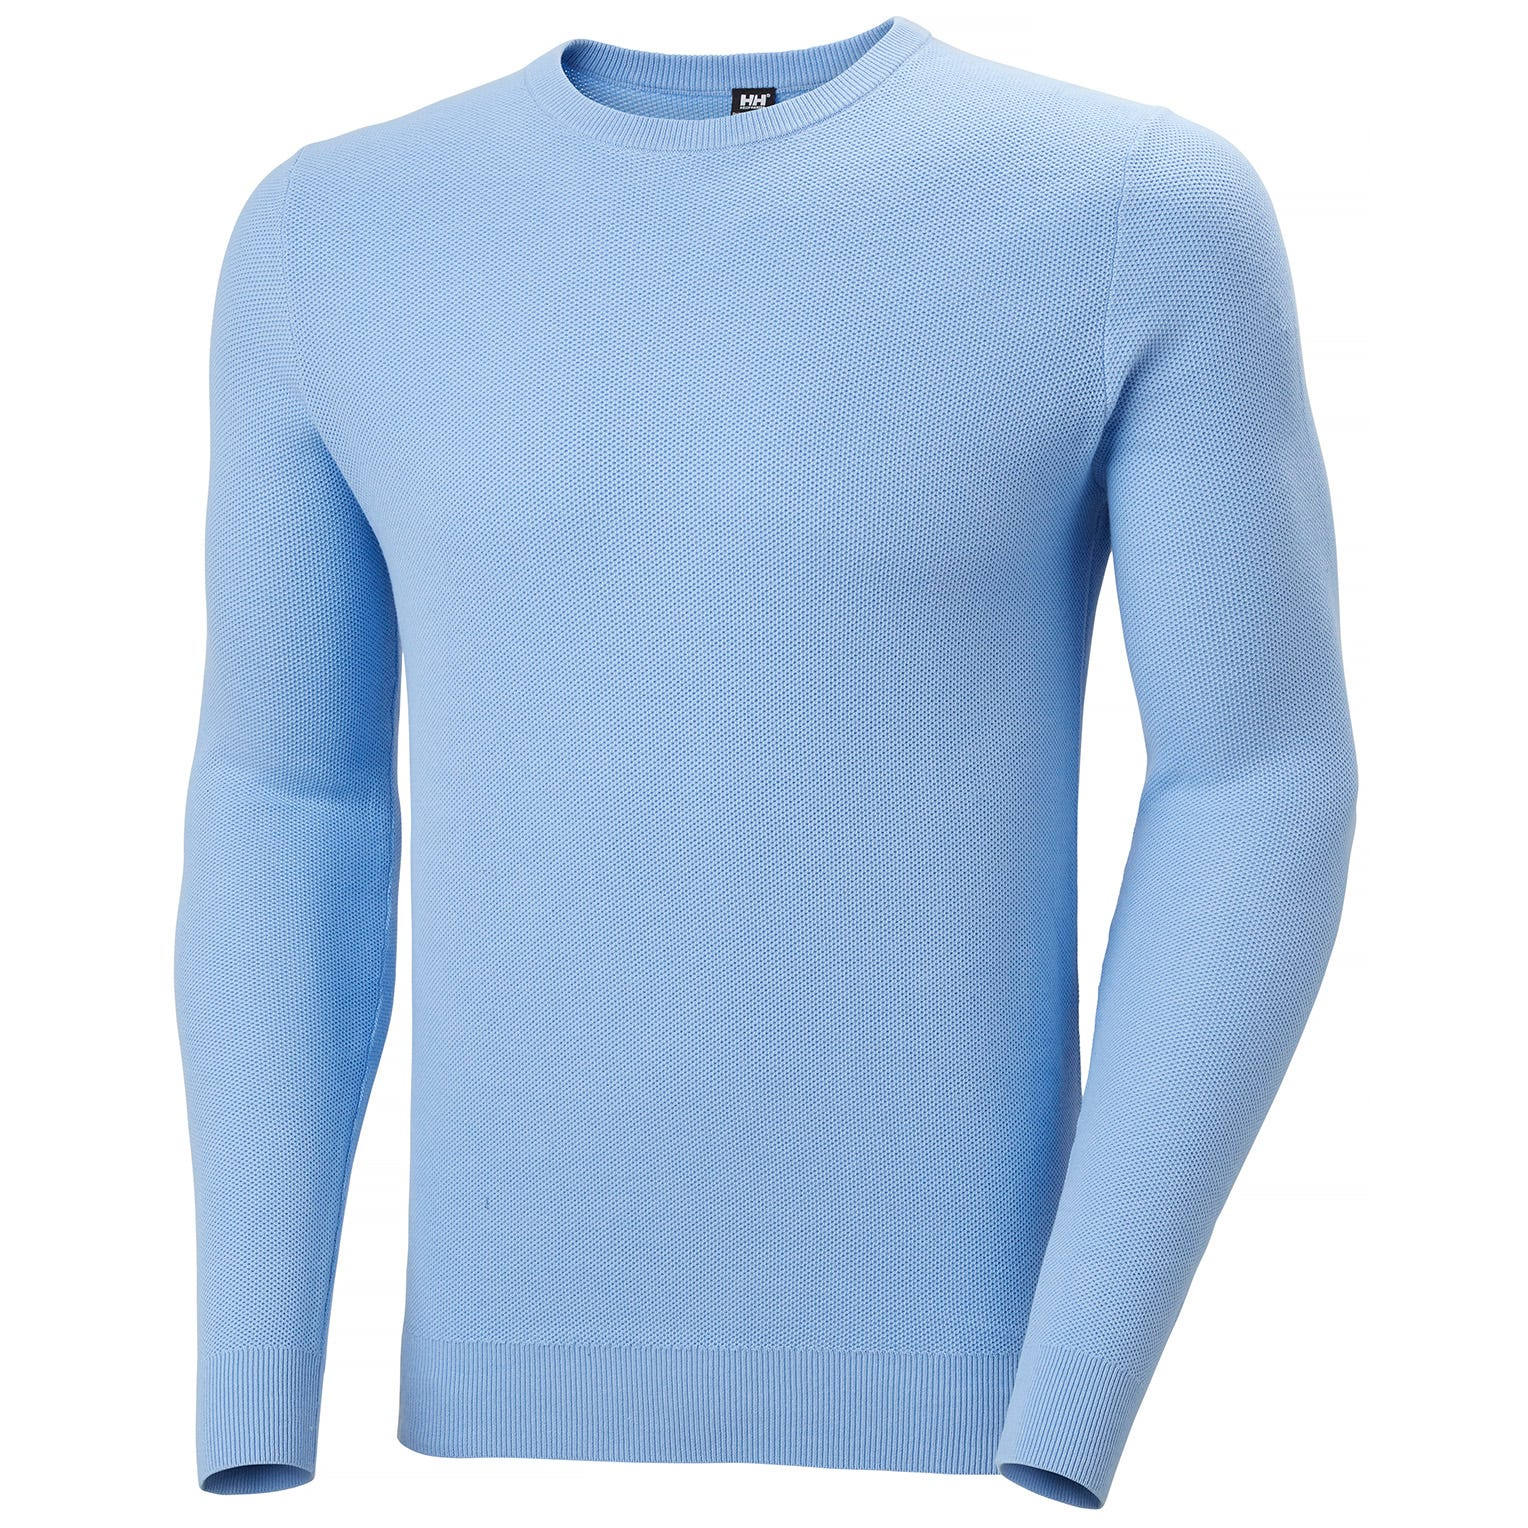 M Hellyhansen Herren Skagen Merino Sweater Sweatshirt Navy